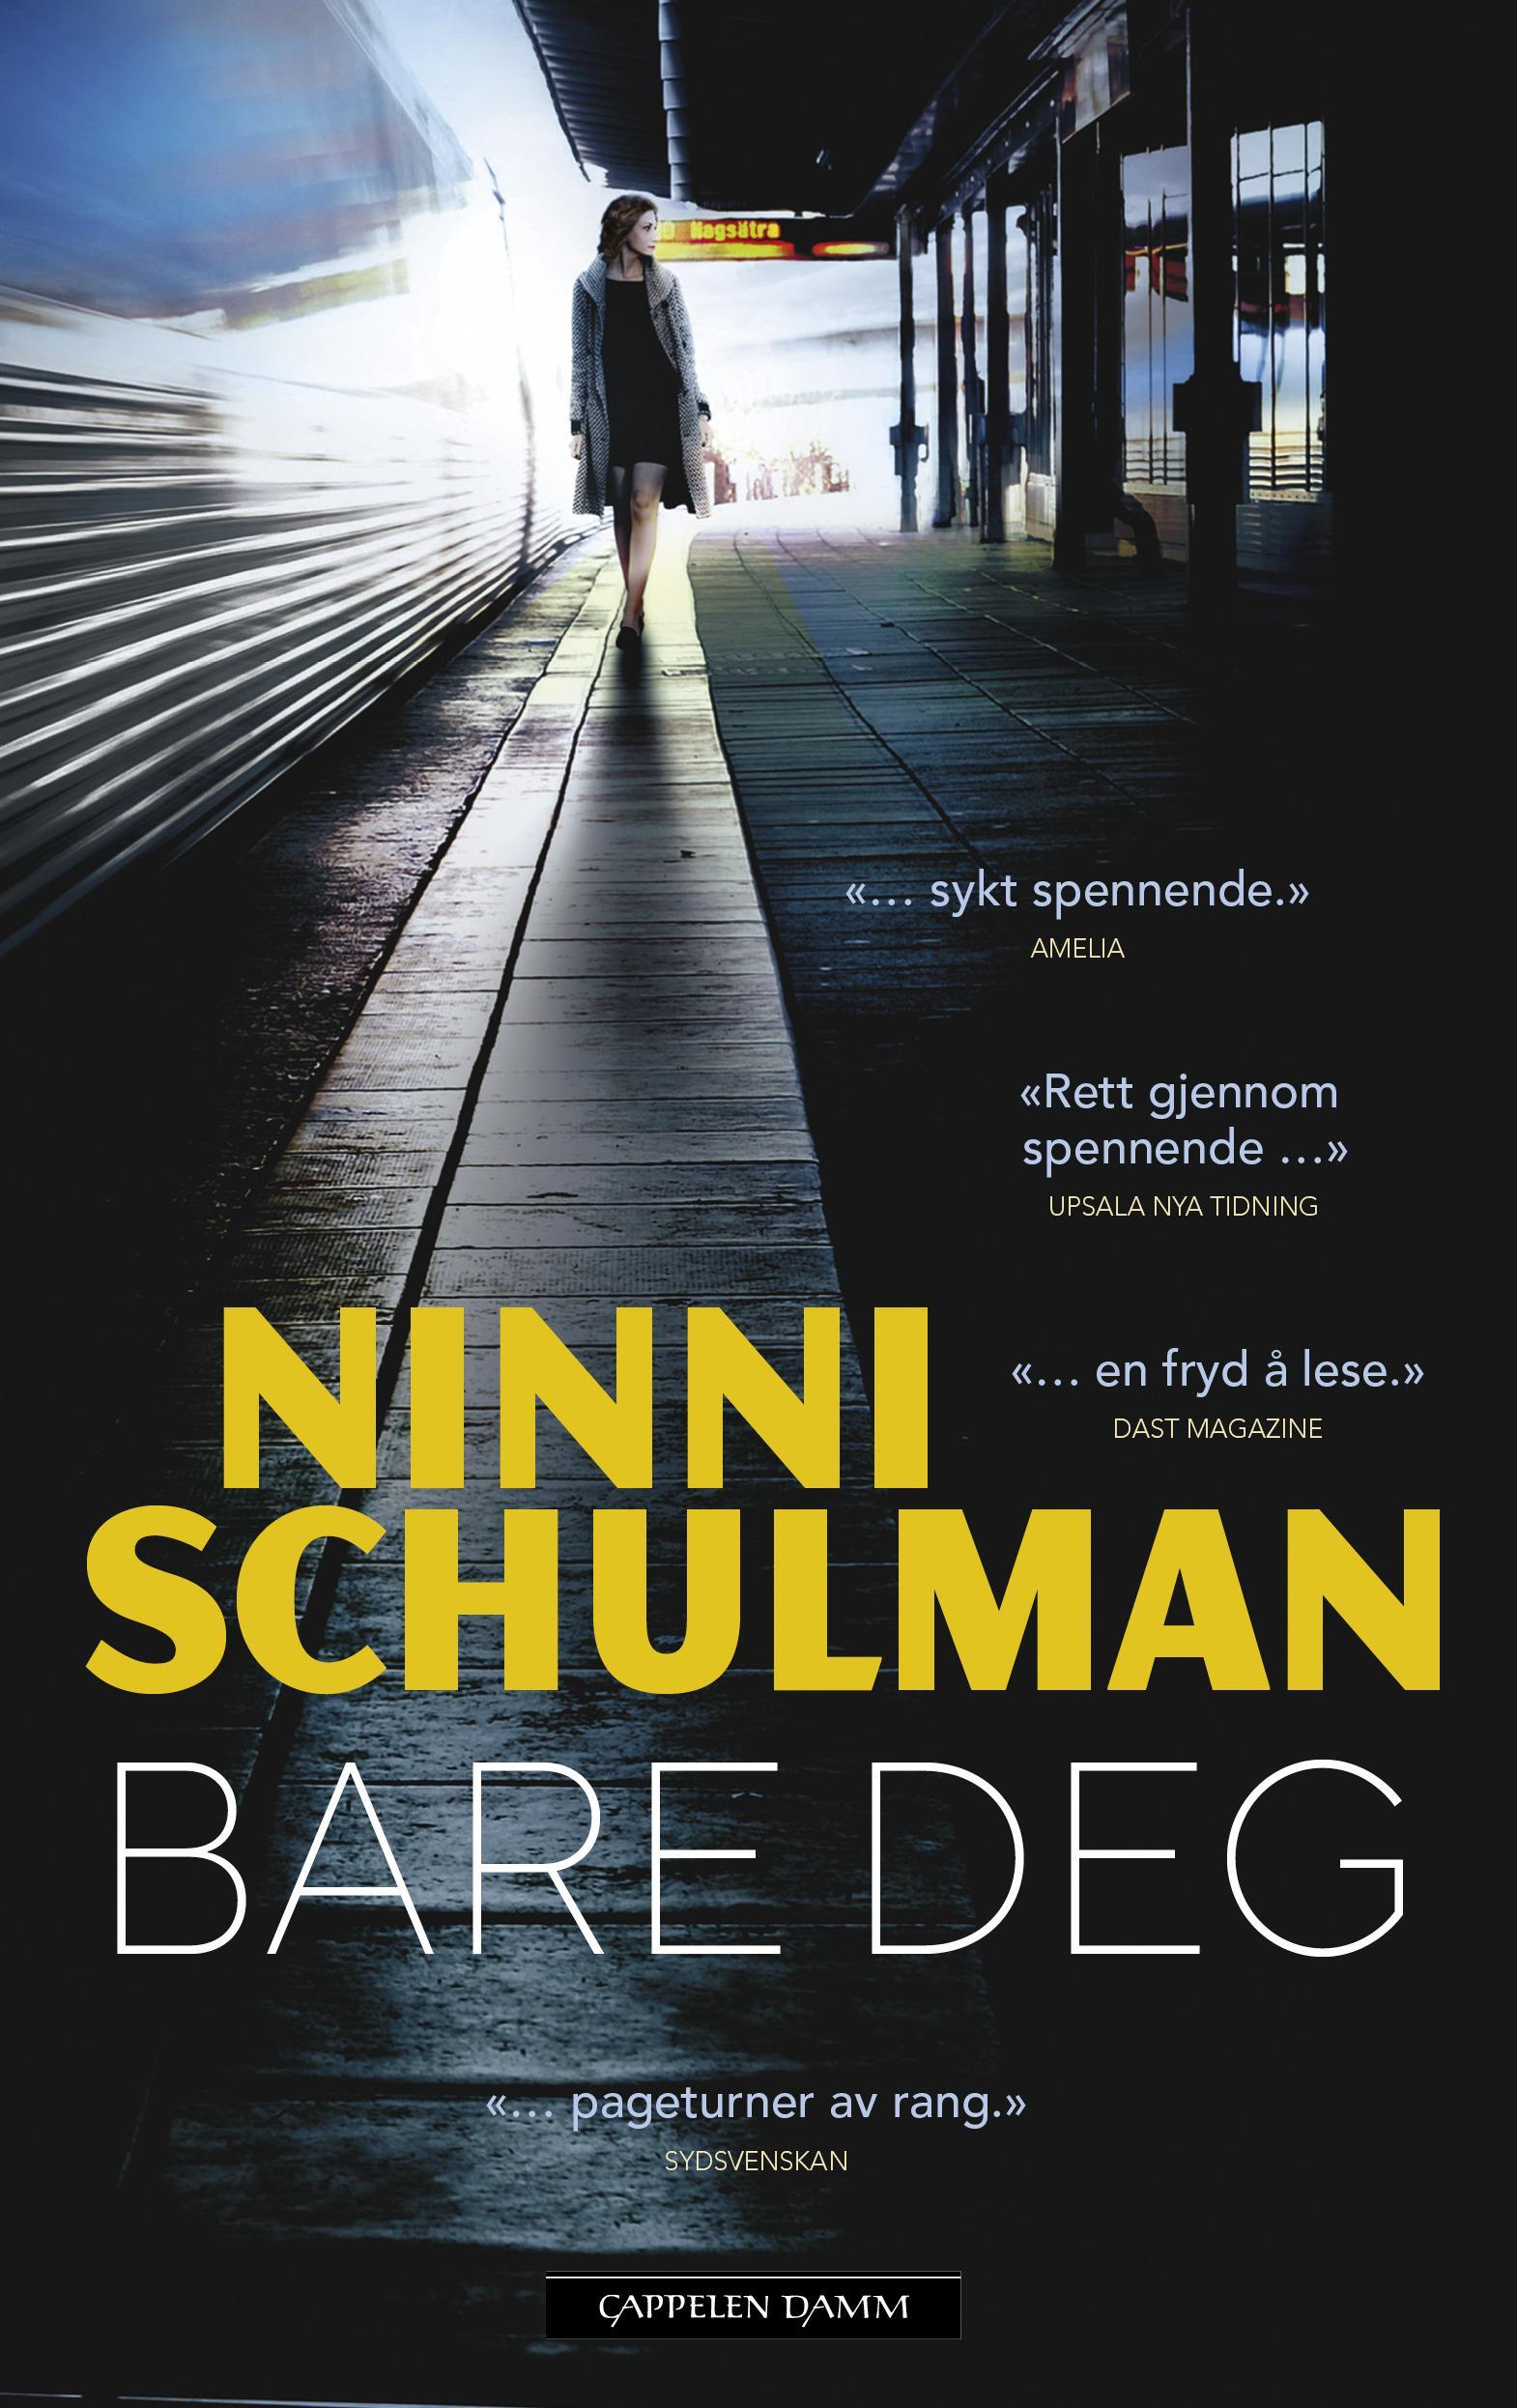 """Bare deg"" av Ninni Schulman"